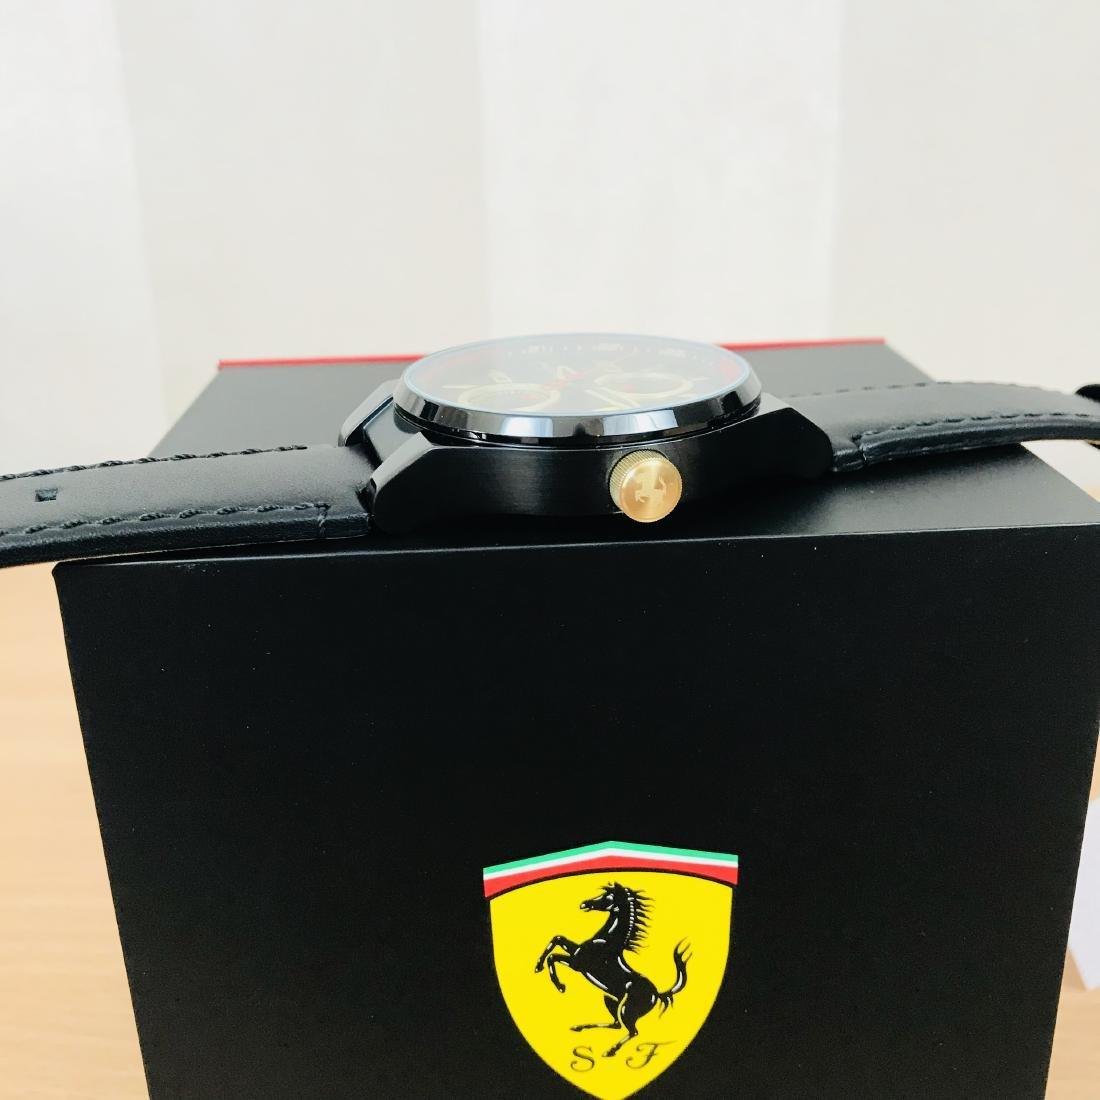 Scuderia Ferrari SPECIALE MULTI Men's Watch - 7